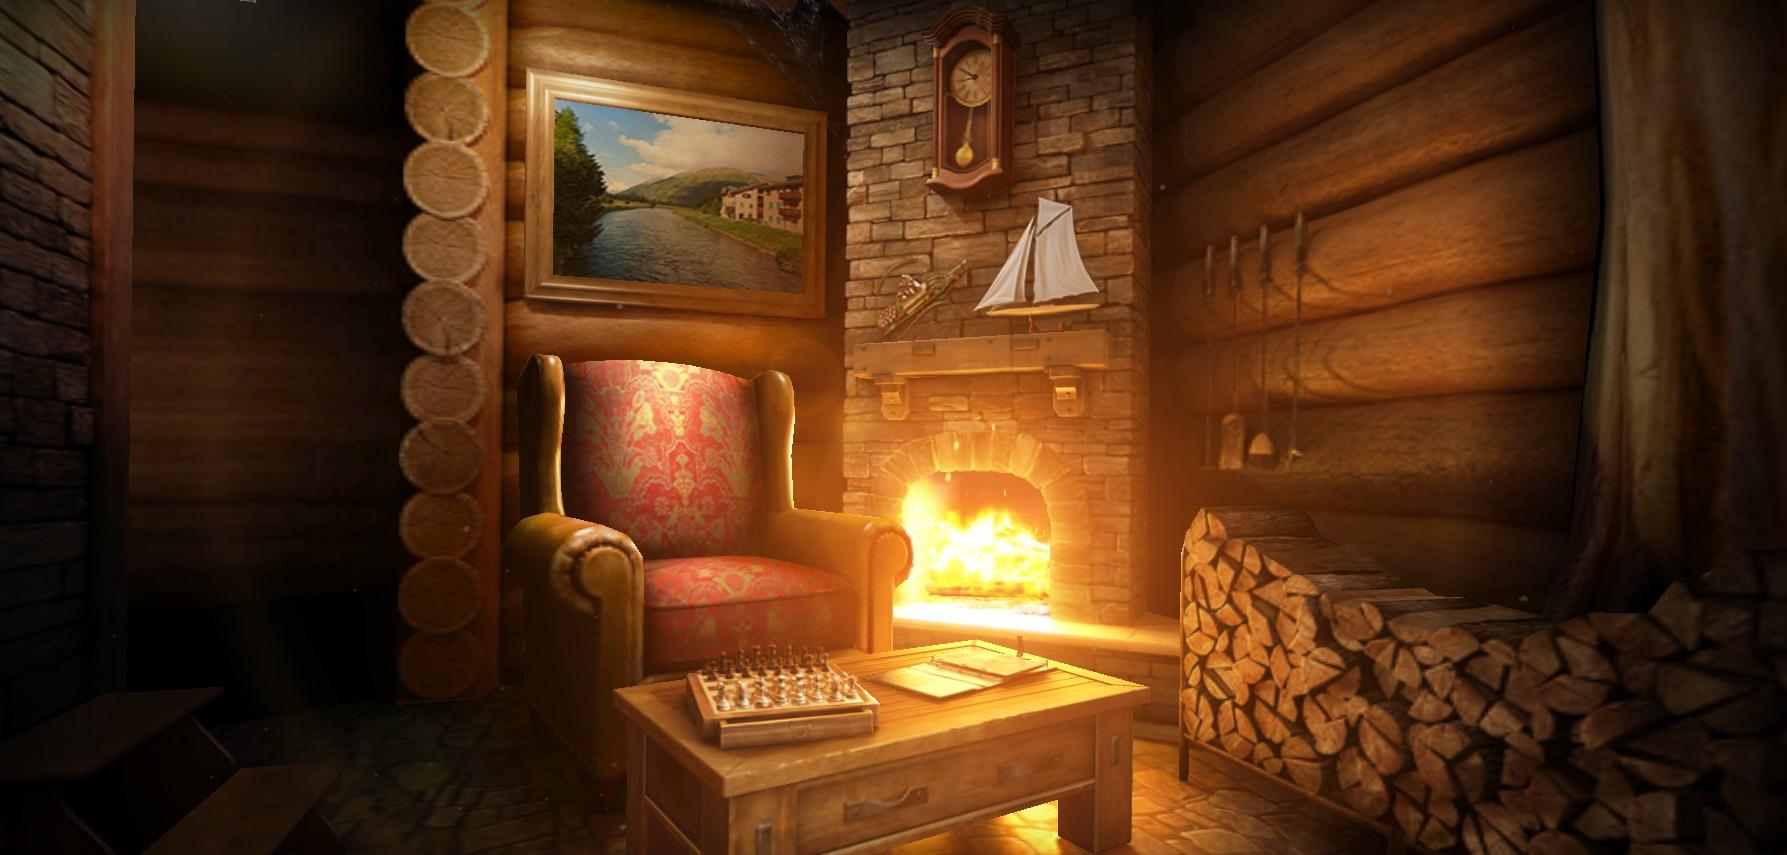 My-Log-Cabin-live-wallpaper